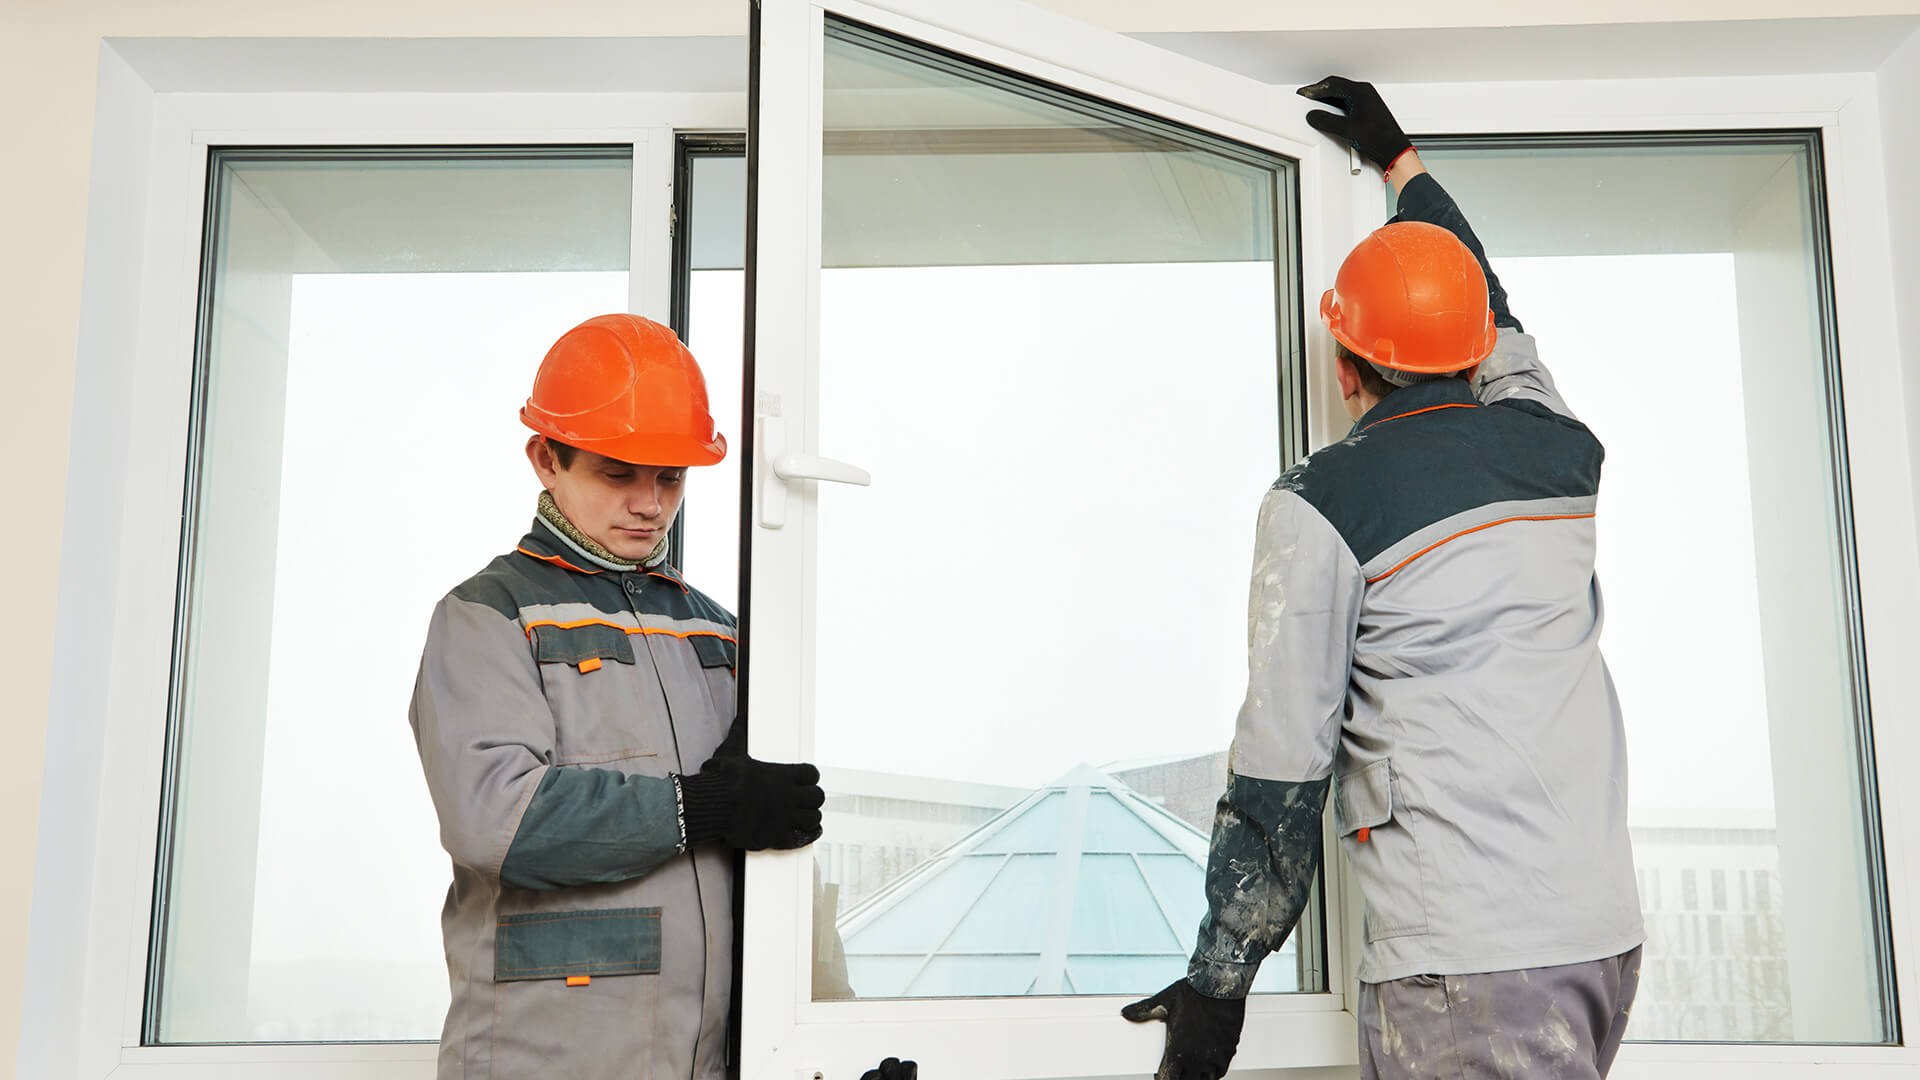 pvc pencere cam imalati - Pencere Camı Tamiri